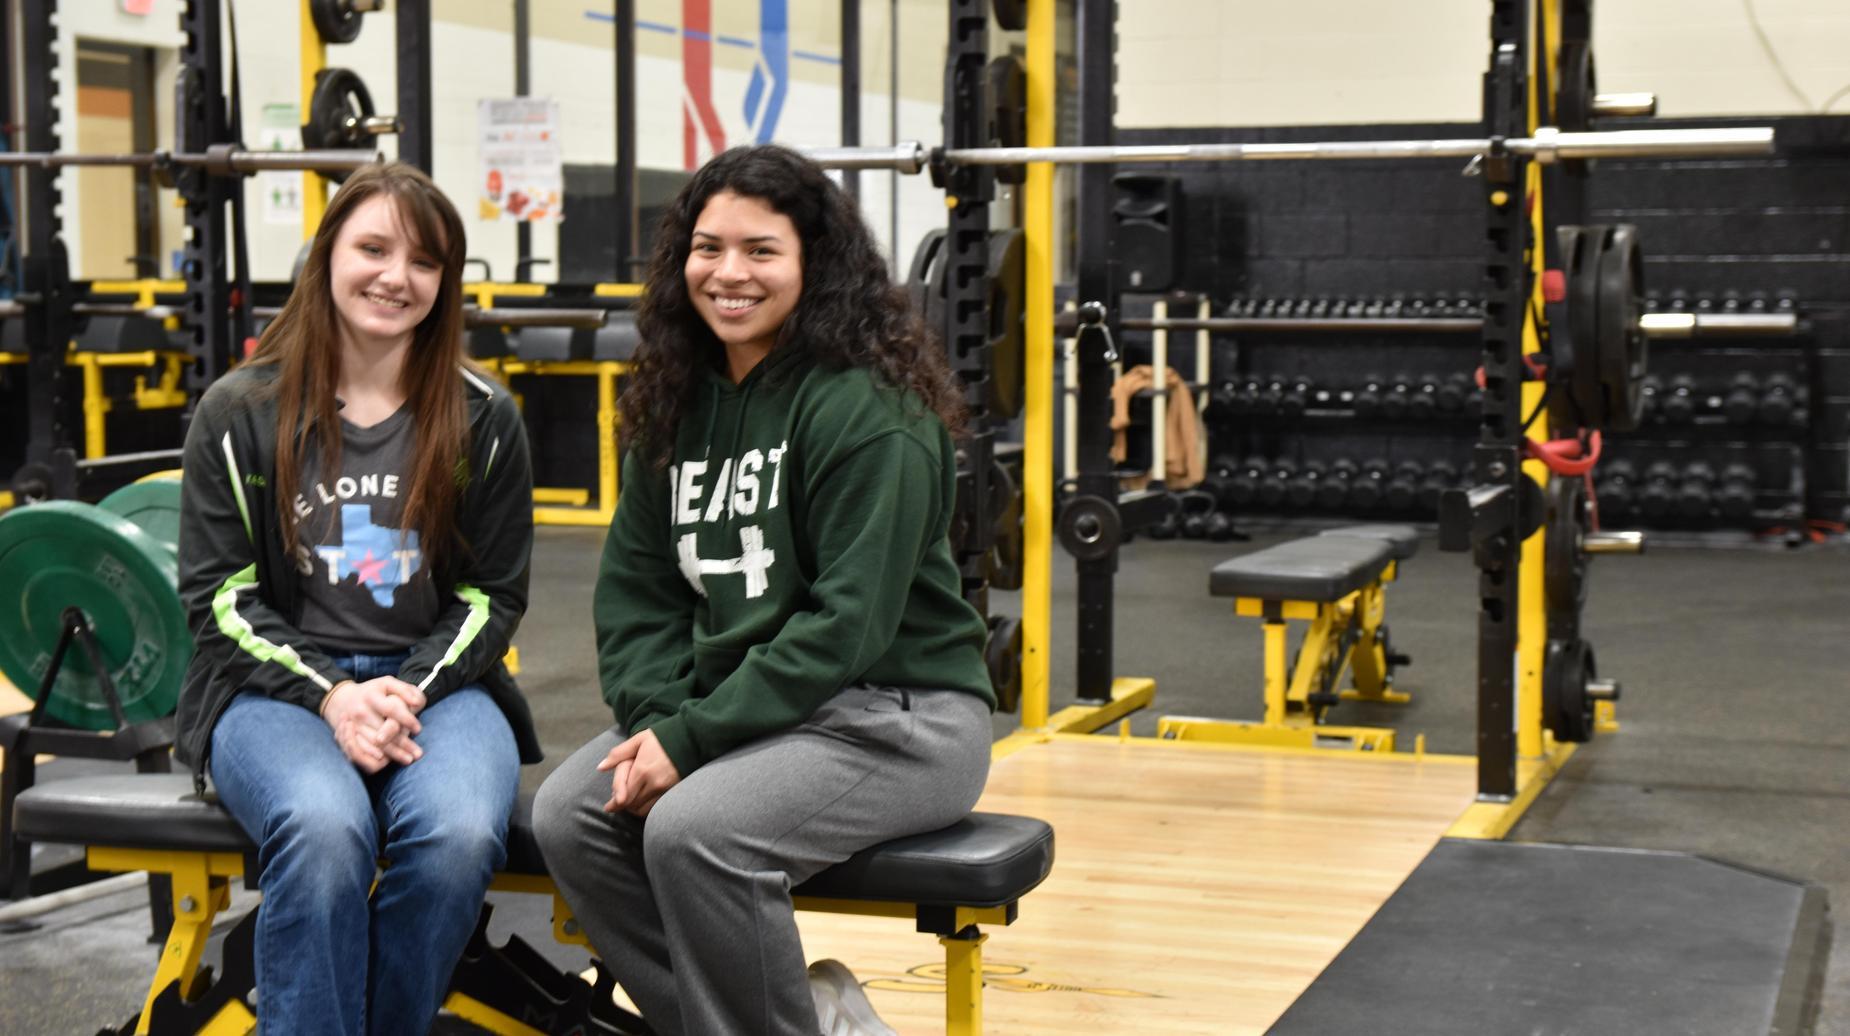 Weightlifting Girls